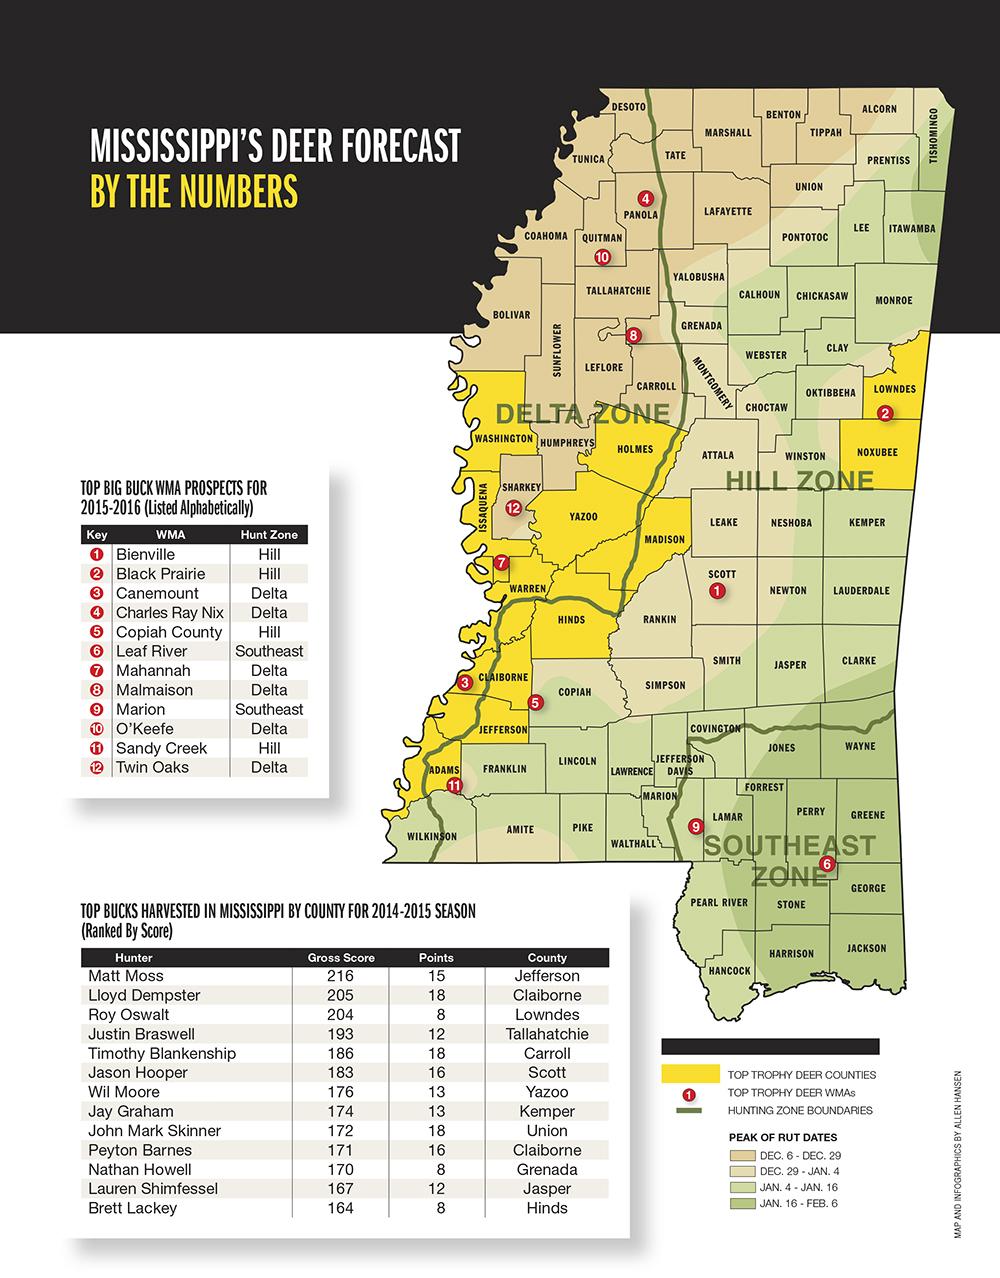 2015 Trophy Deer Forecast: Louisiana intended for Whitetail Deer Rut Calendar